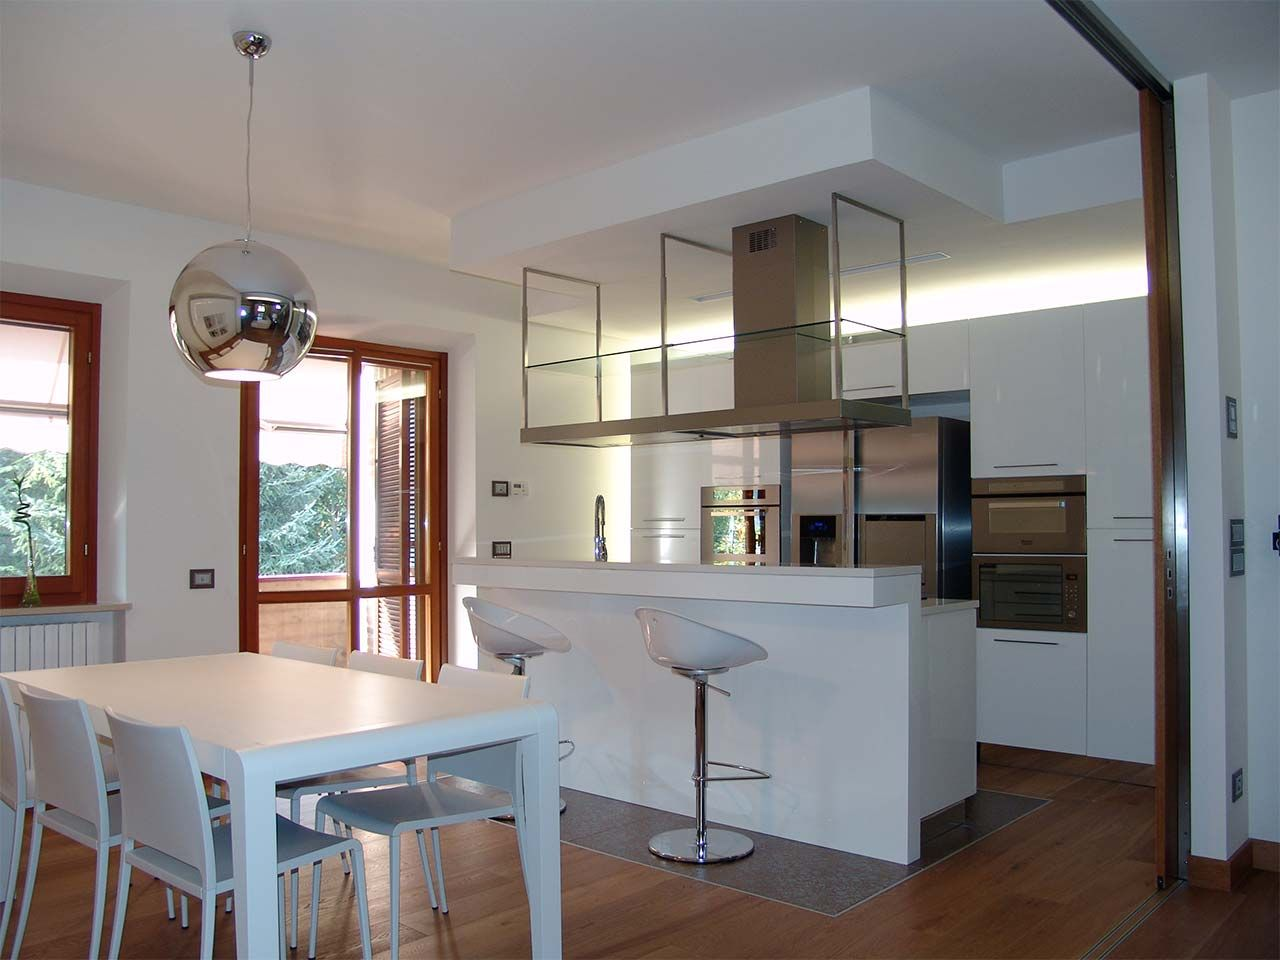 Cucina con isola | by ArredamentiAncona.it | cucina / kitchen ...